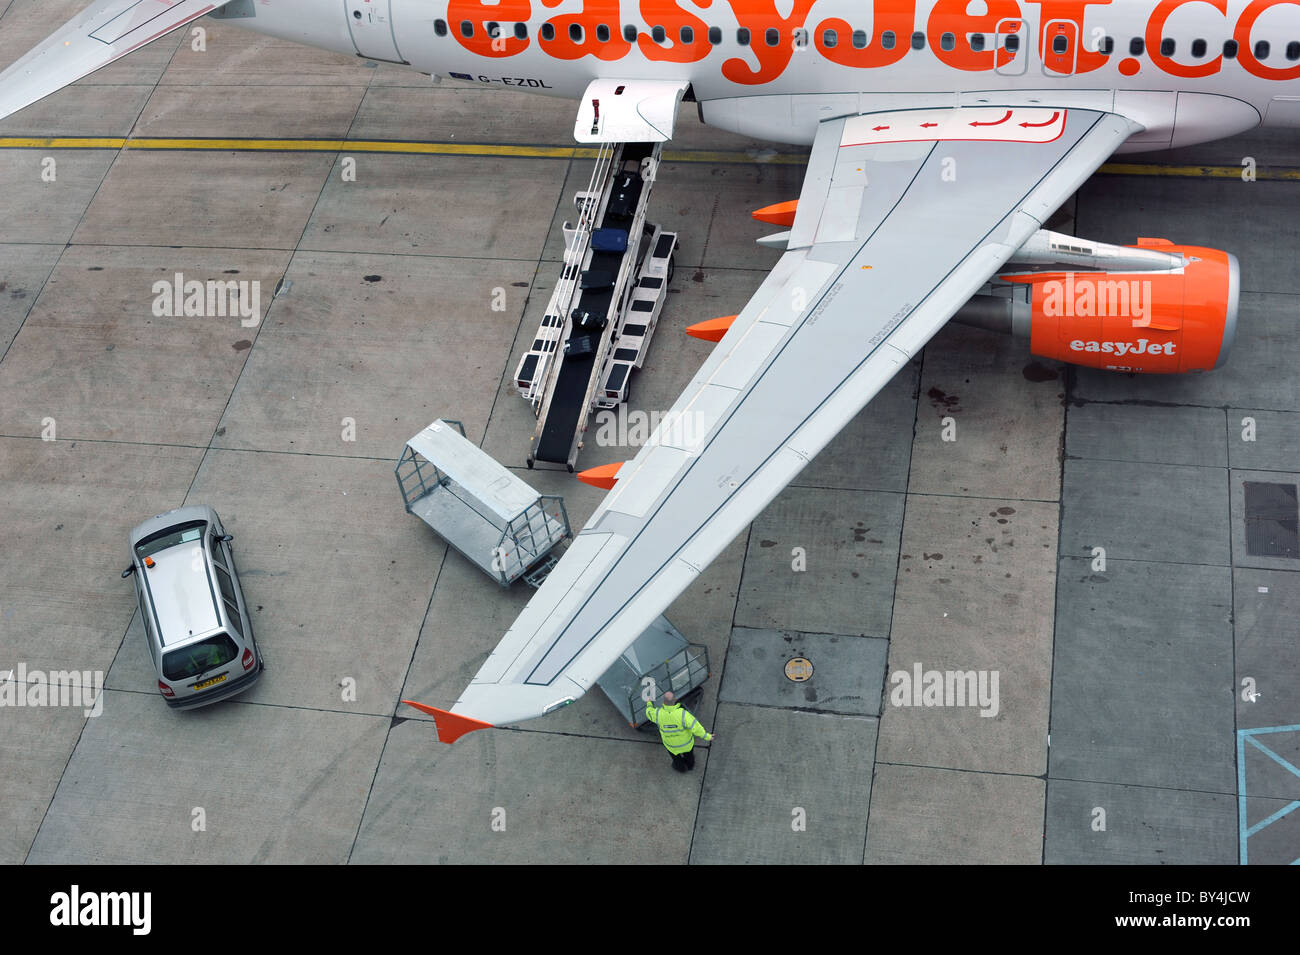 Airside baggage handling at Gatwick airport, UK - Stock Image